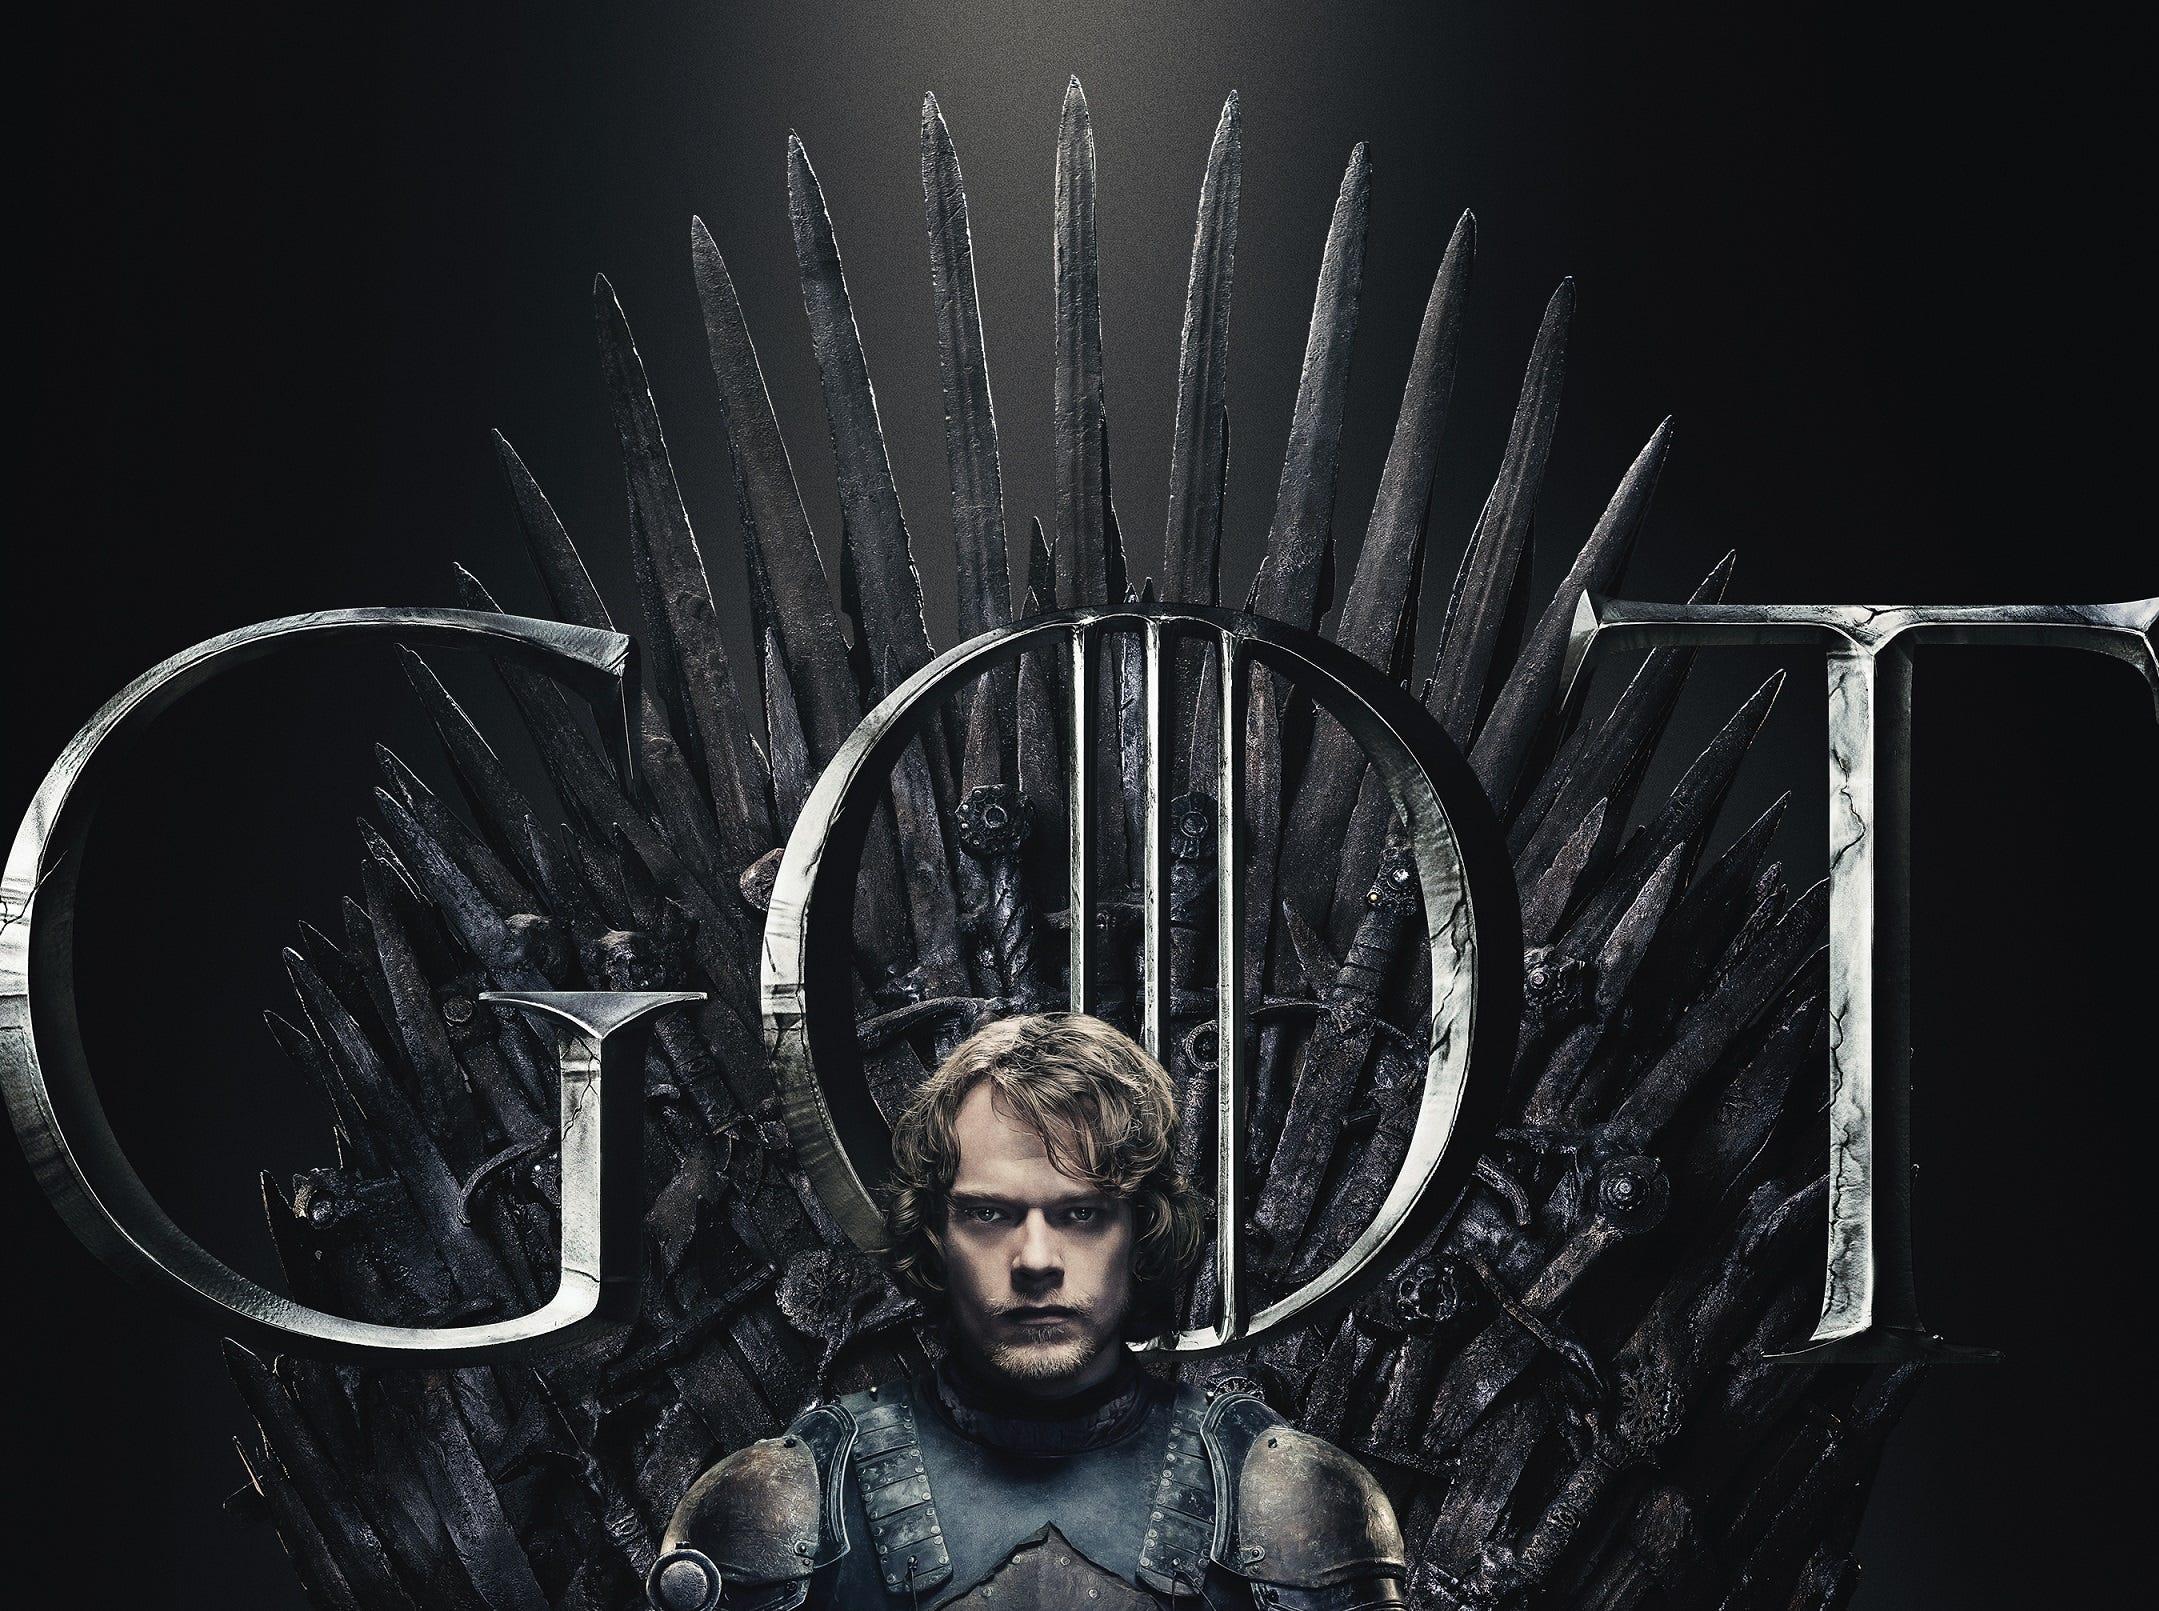 Theon (Alfie Allen) is back in his Greyjoy armor, at last.